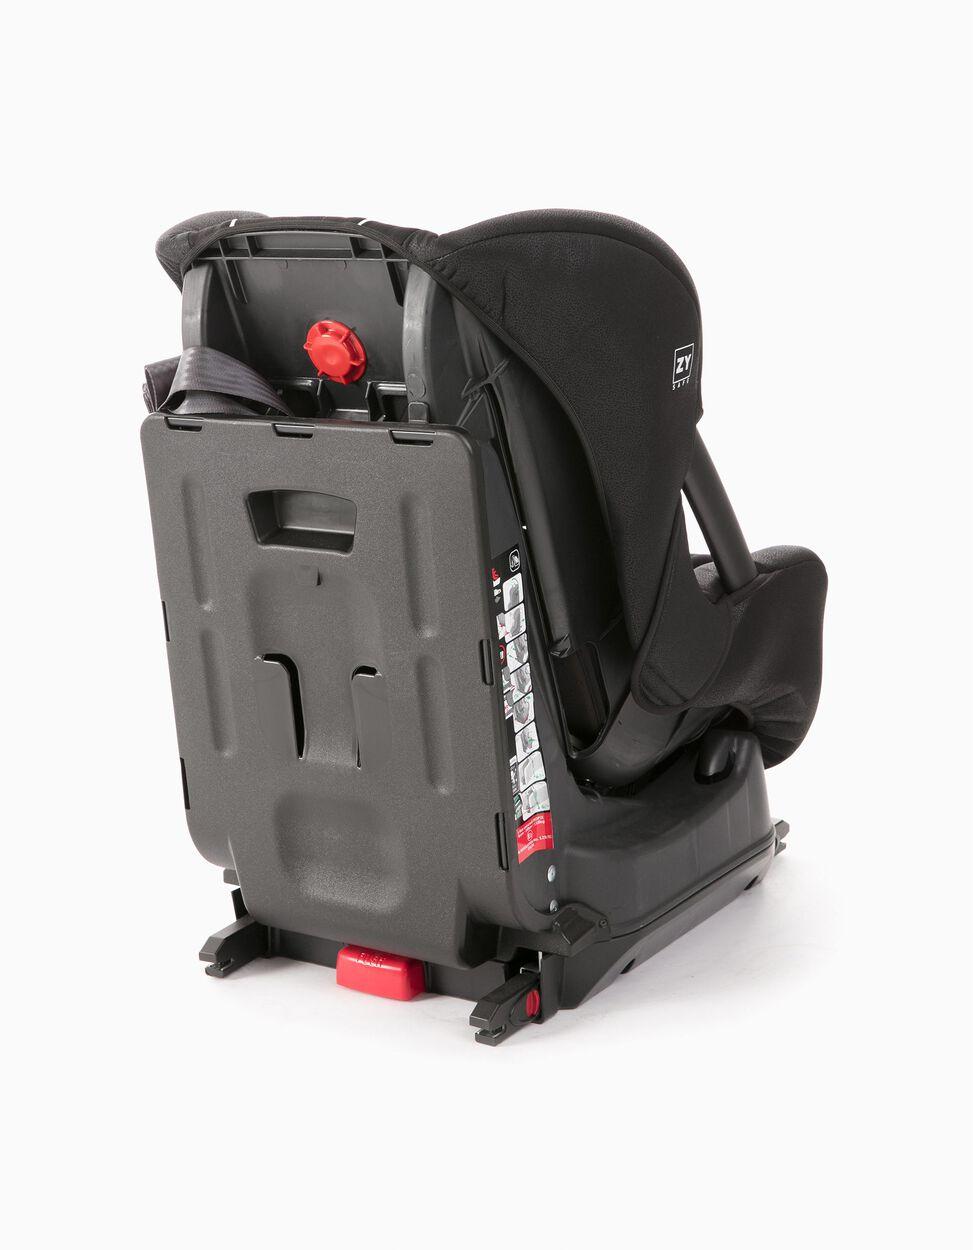 Cadeira Auto I-Size Primecare Prestige Zy Safe